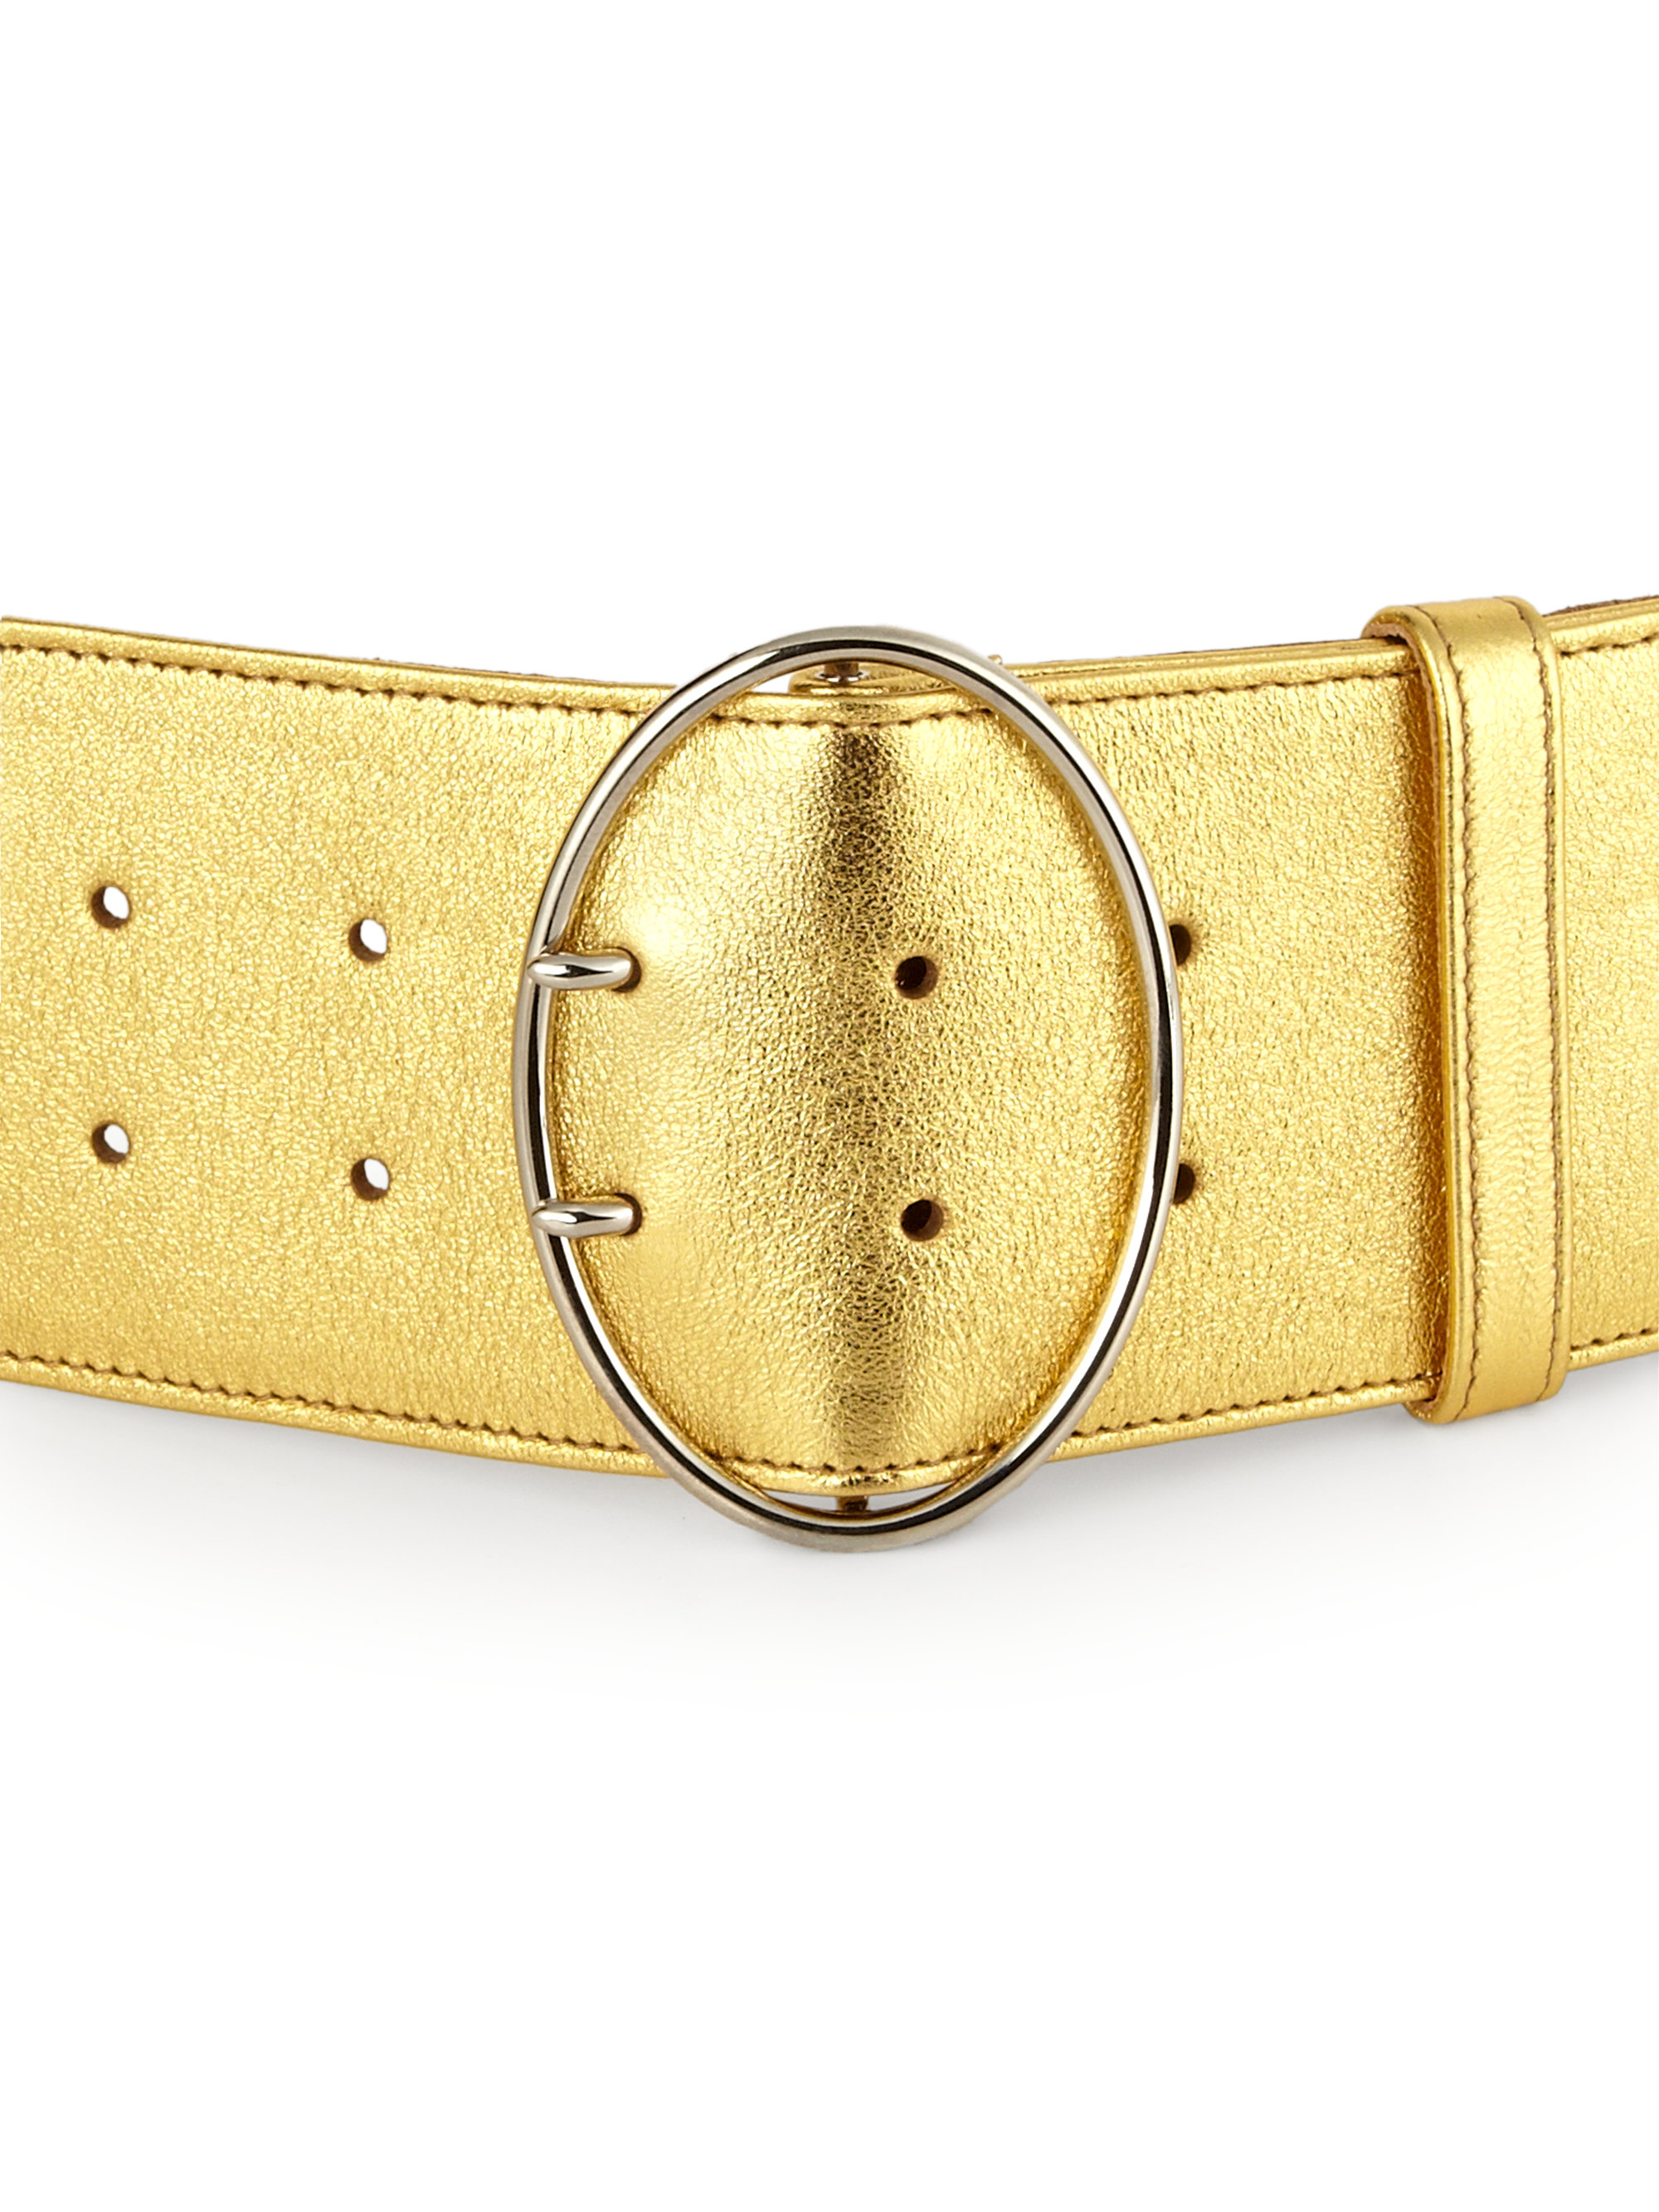 Prada Wide Metallic Leather Belt in Gold | Lyst